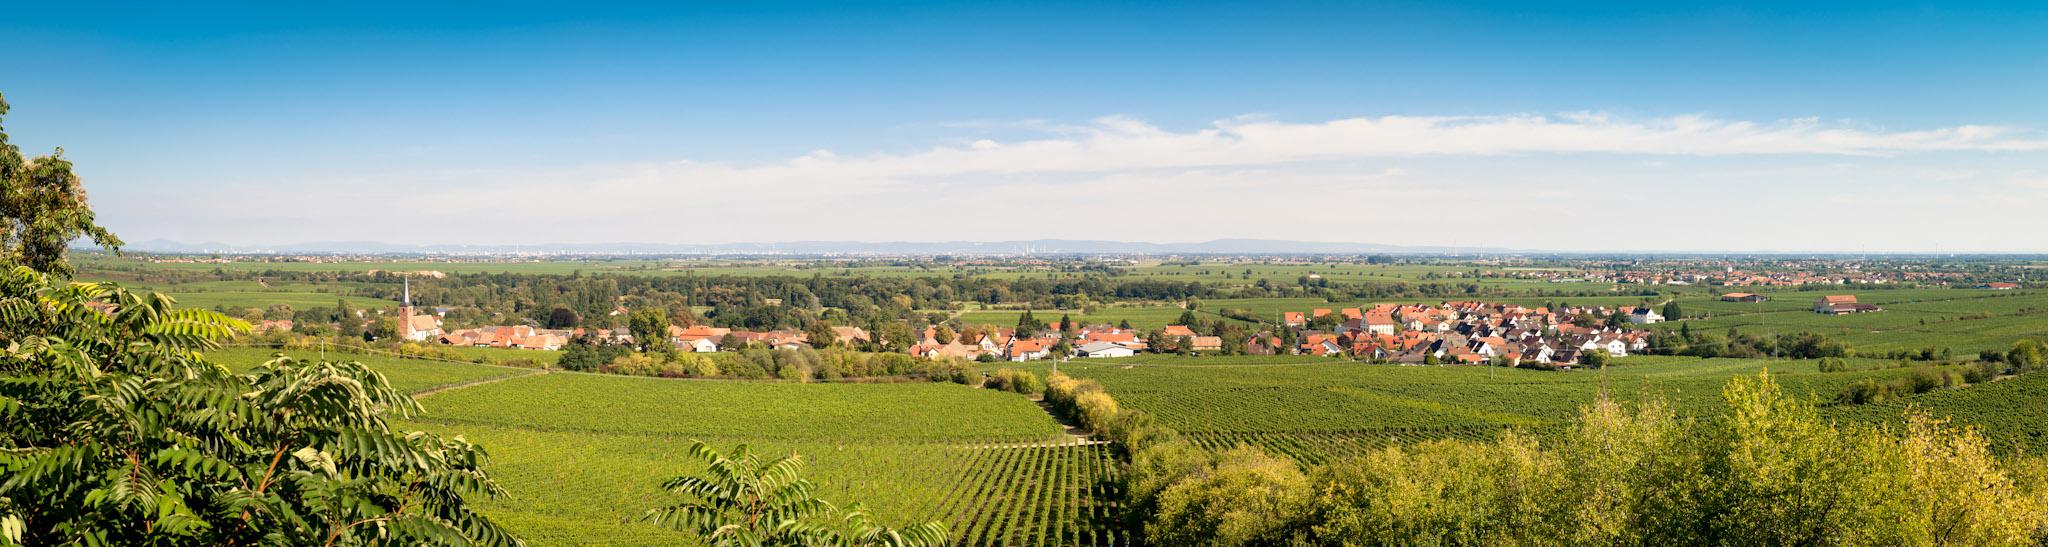 Panoramabild Forst - Rheinland-Pfalz